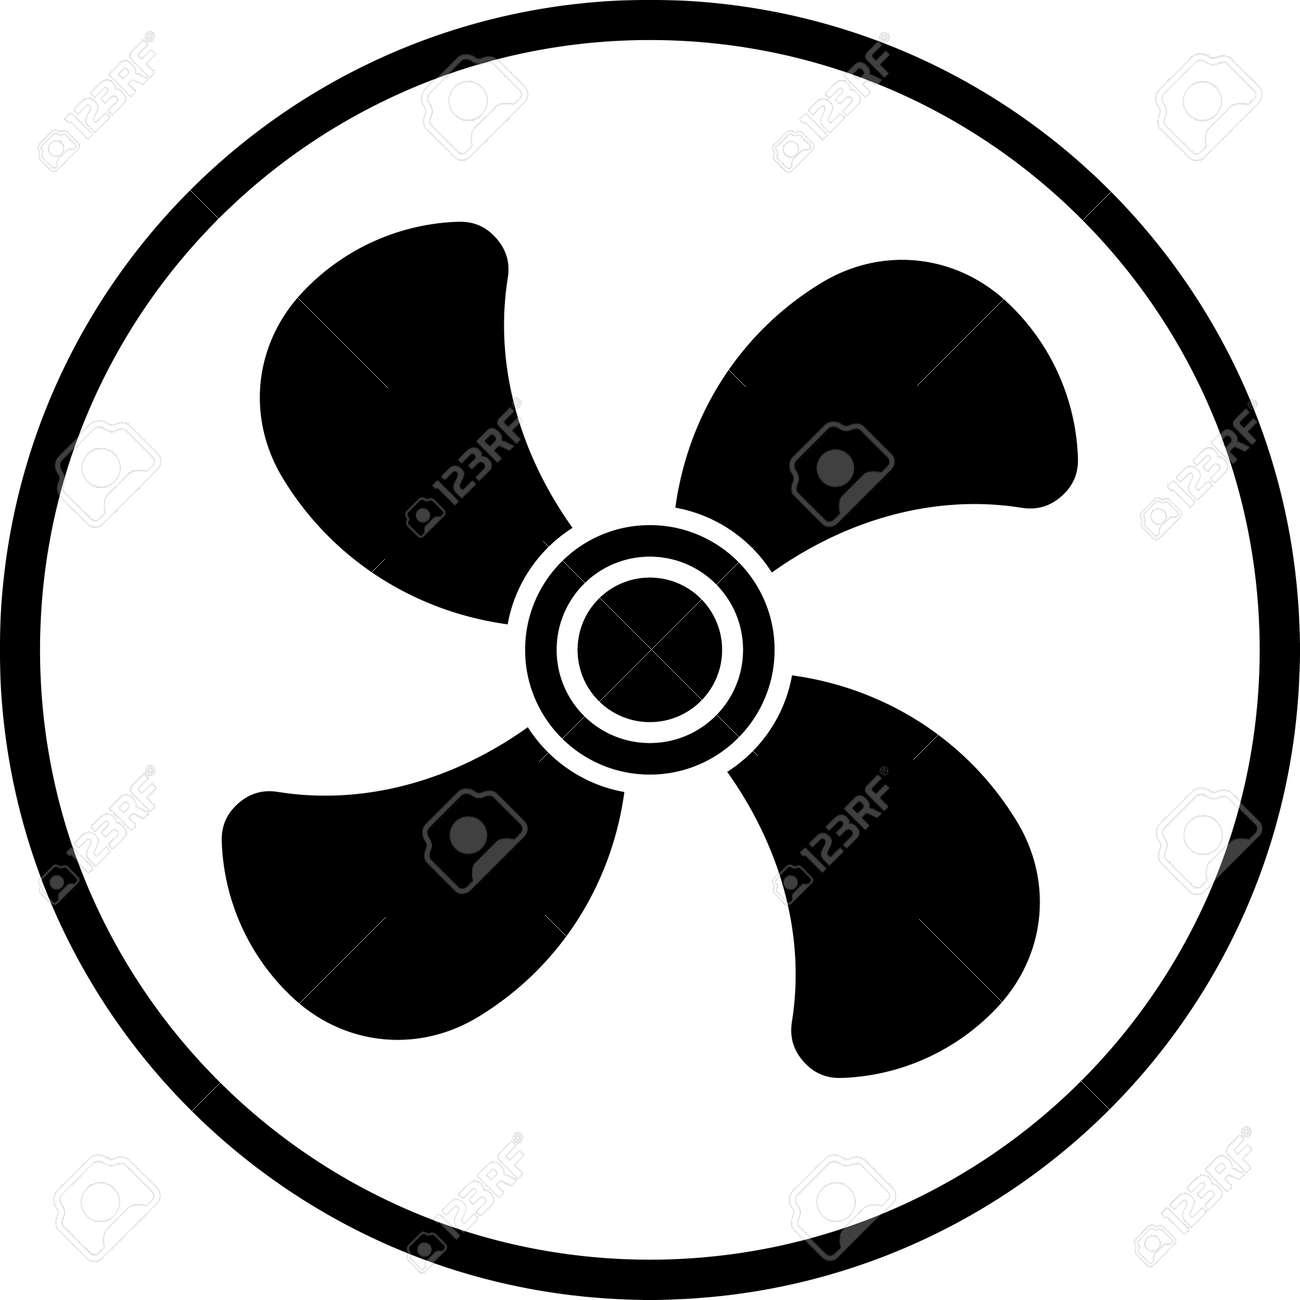 Ventilator Bilder ventilator bilder pattern of industrial metal pipes of a